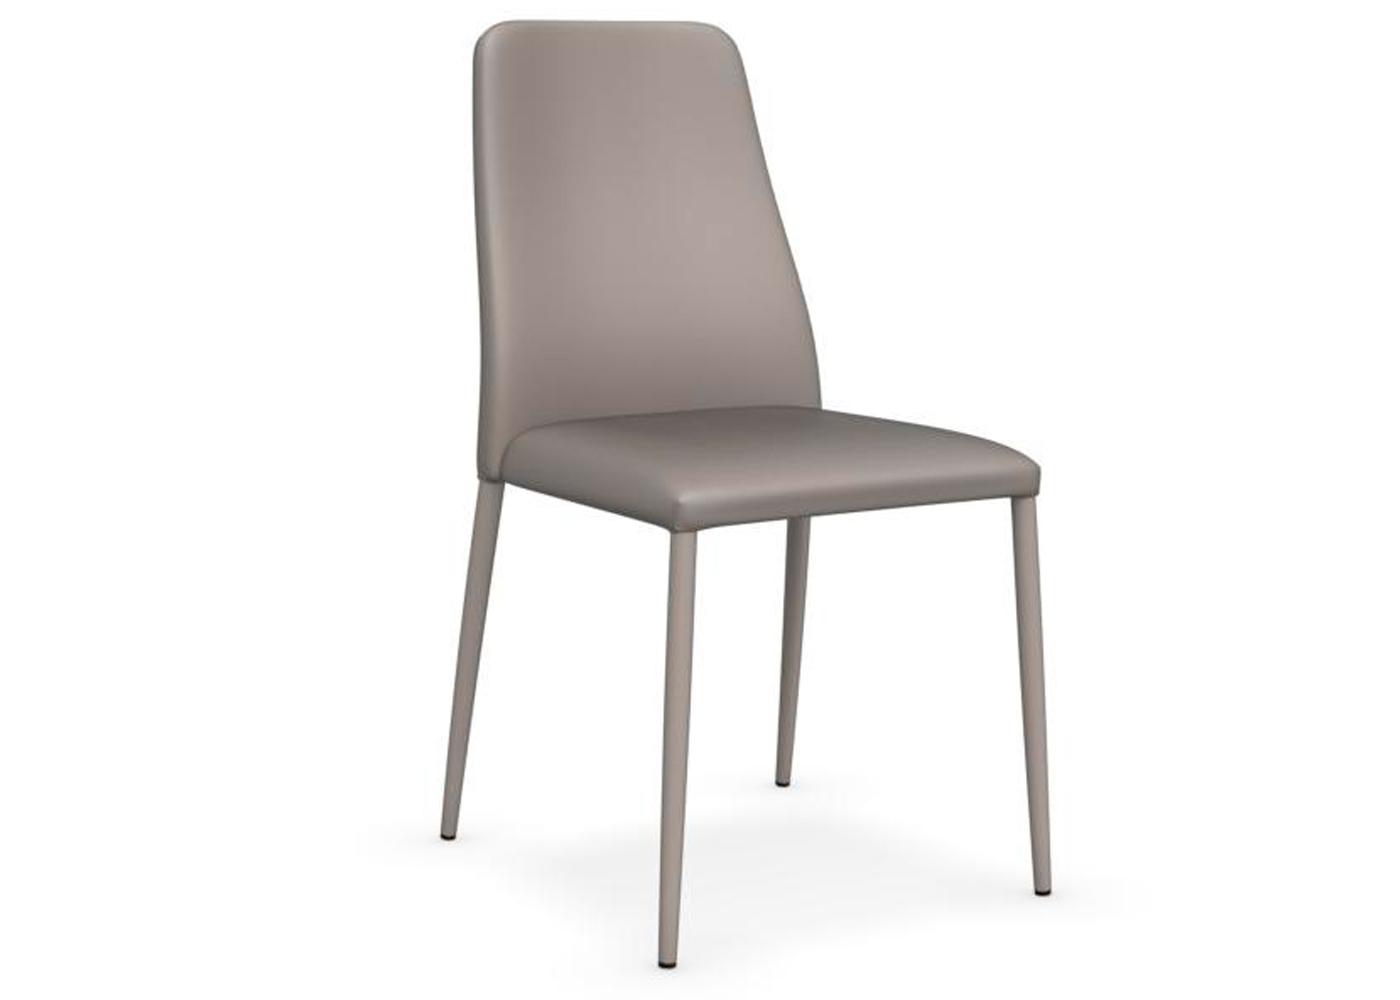 calligaris sofas uk single sofa chair bed club midfurn furniture superstore